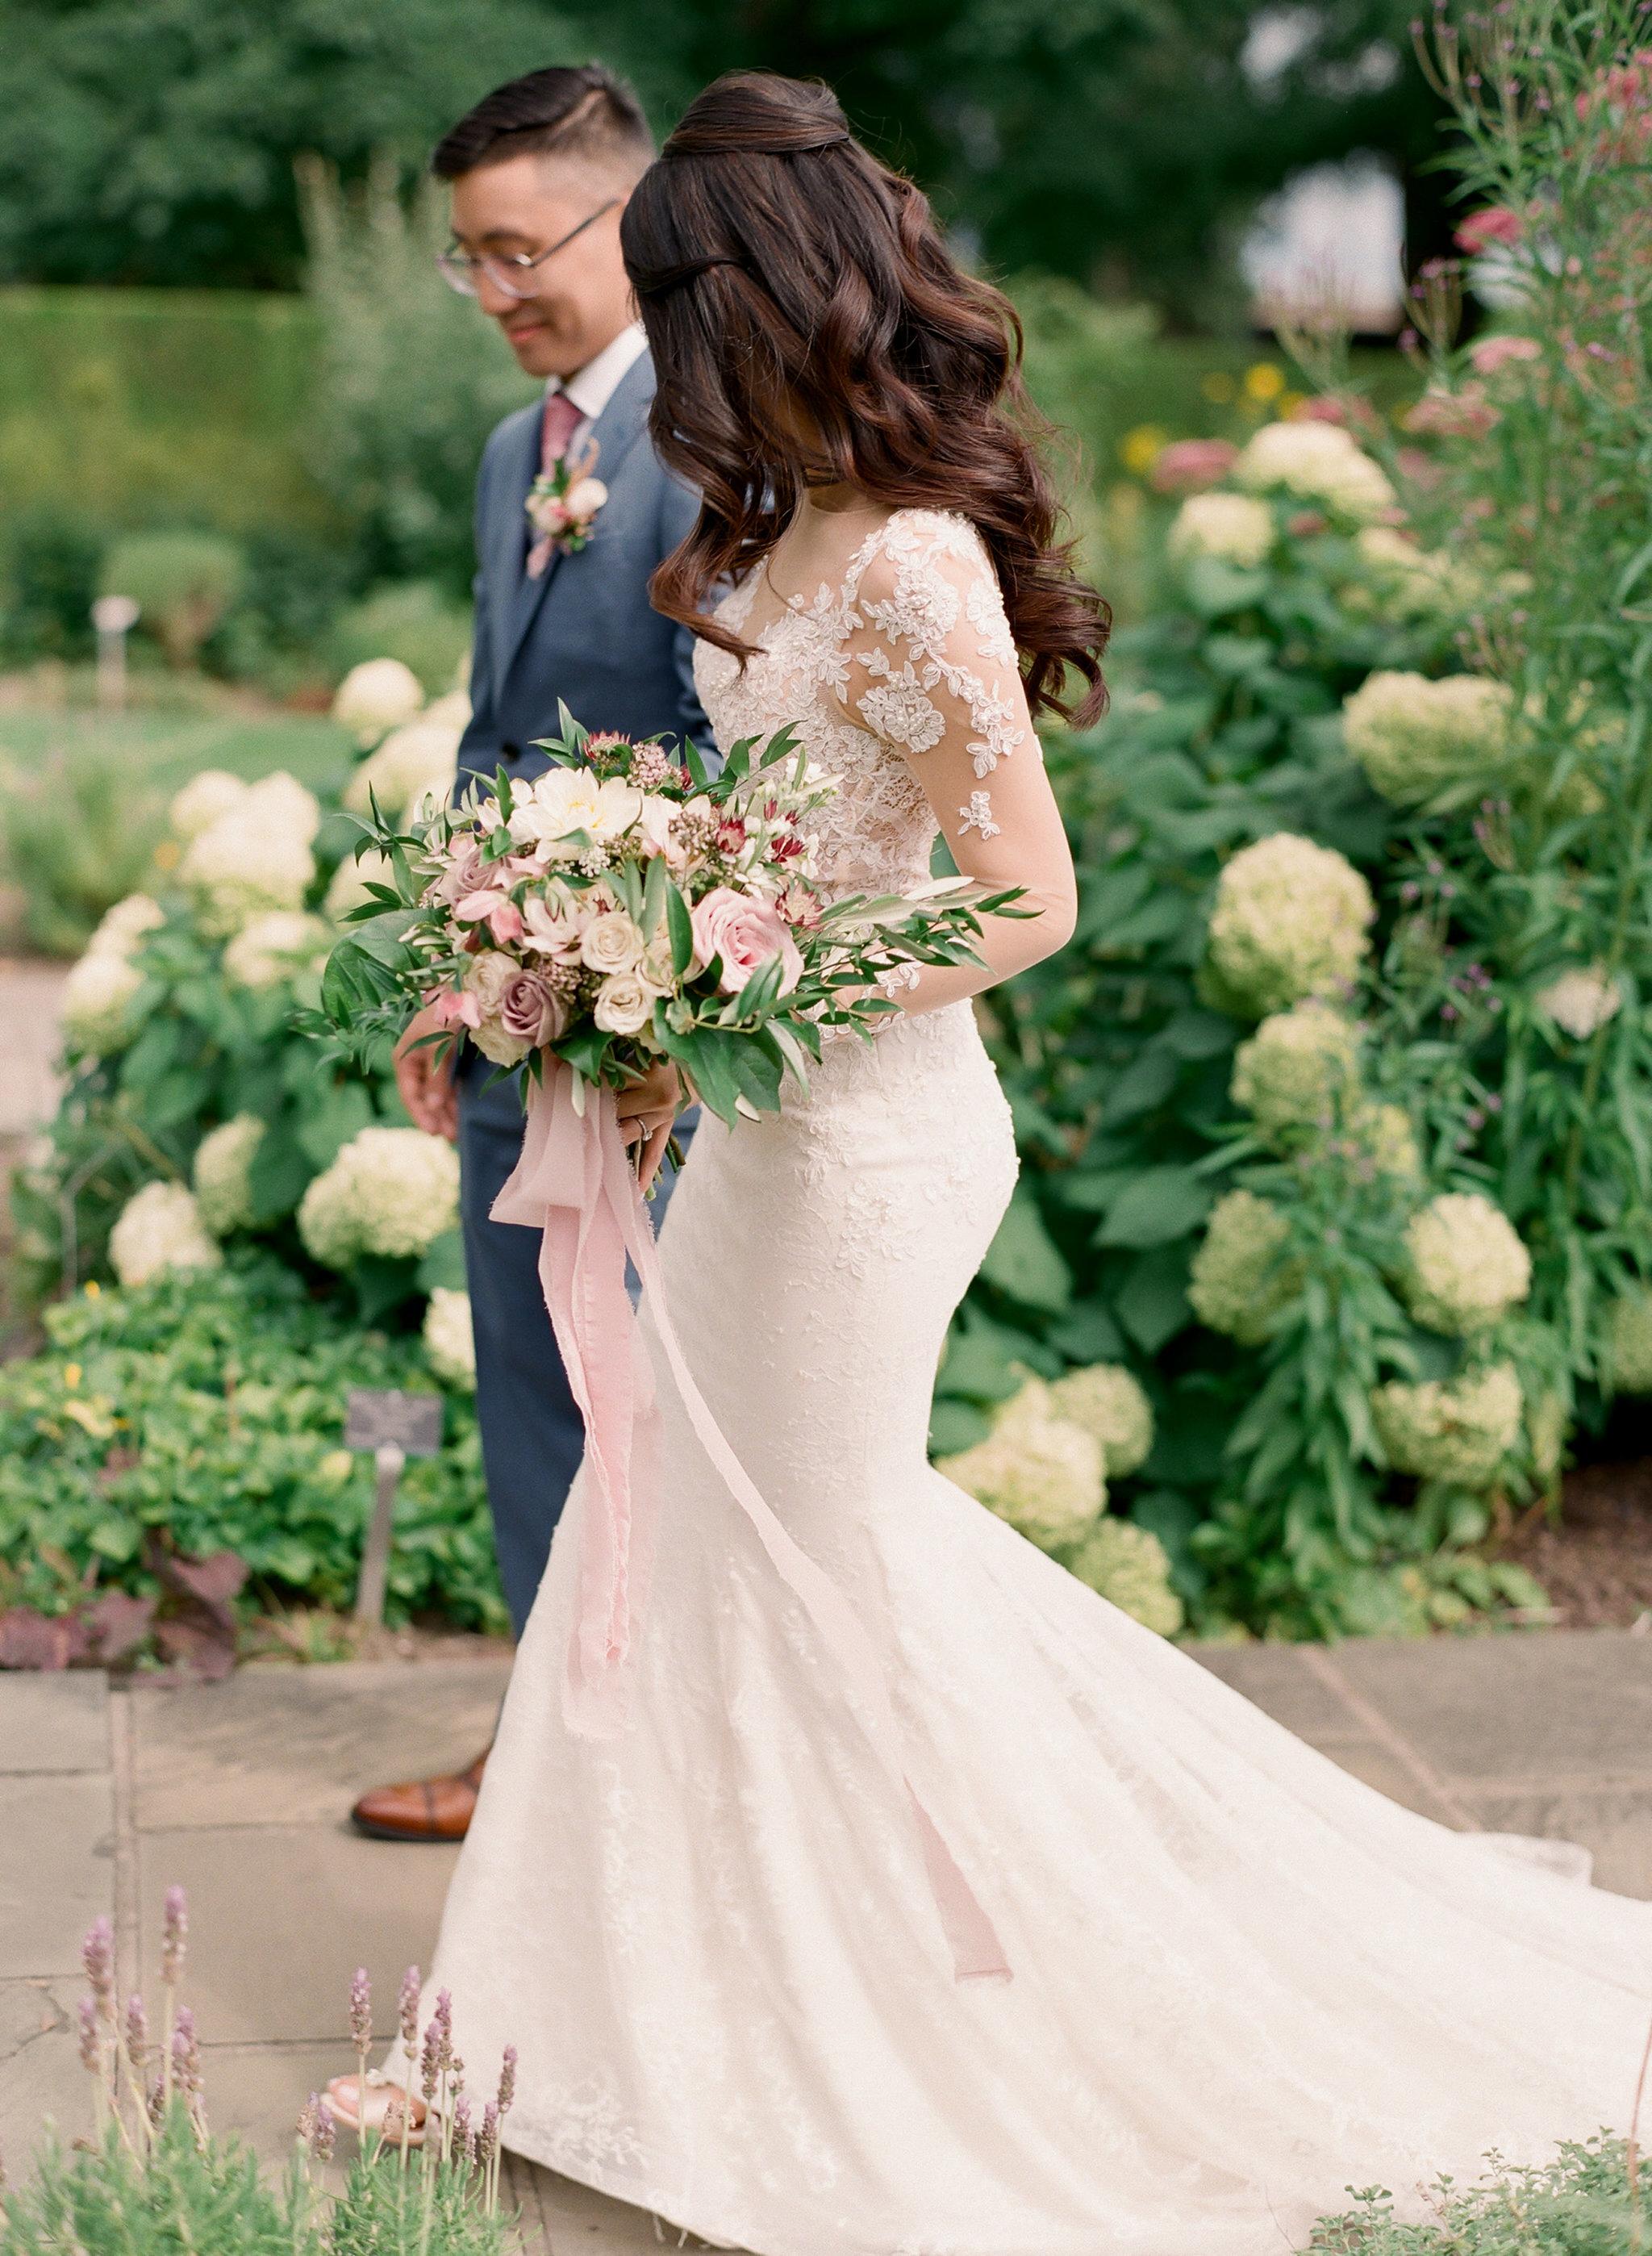 0345-artiese-chateau-des-charmes-wedding-sonia-tim-000095230009.jpg